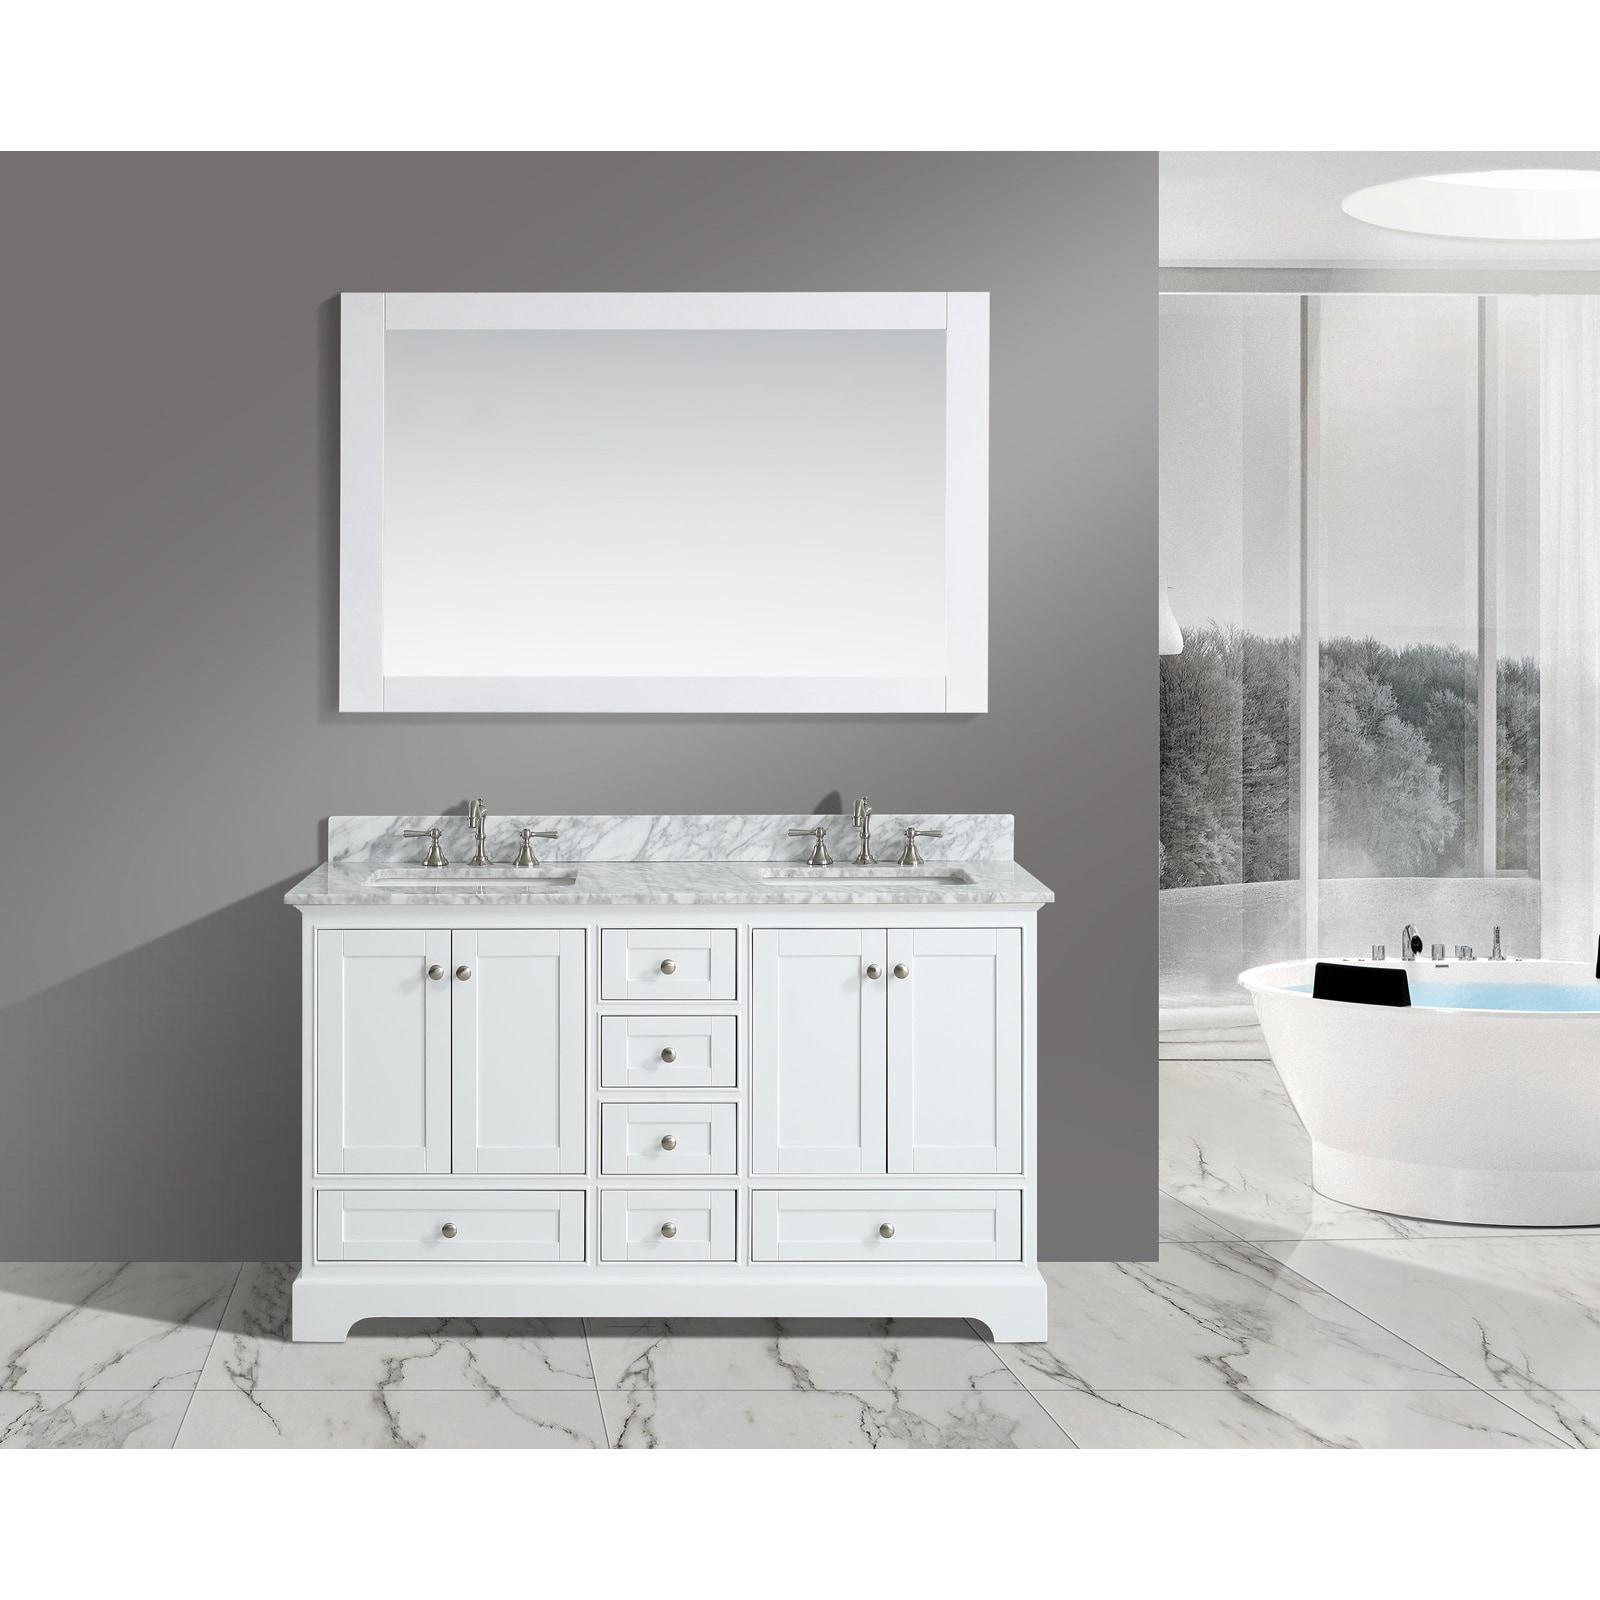 Urban Furnishing Jocelyn White Italian Carrara Marble 60-...